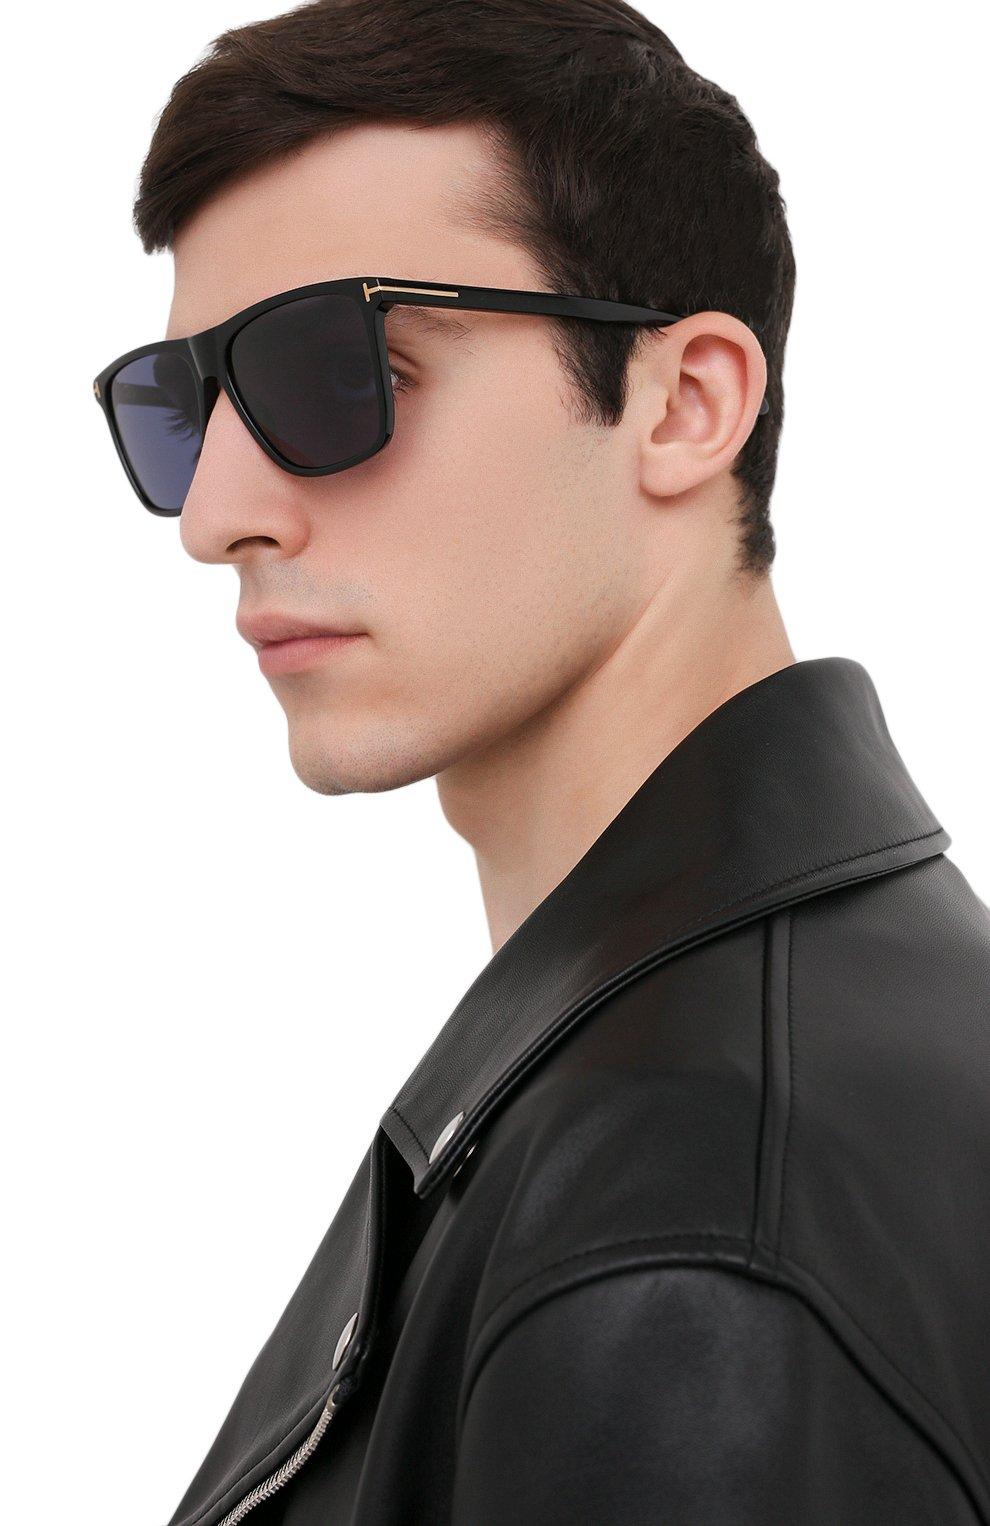 Мужские солнцезащитные очки TOM FORD черного цвета, арт. TF832 01V | Фото 2